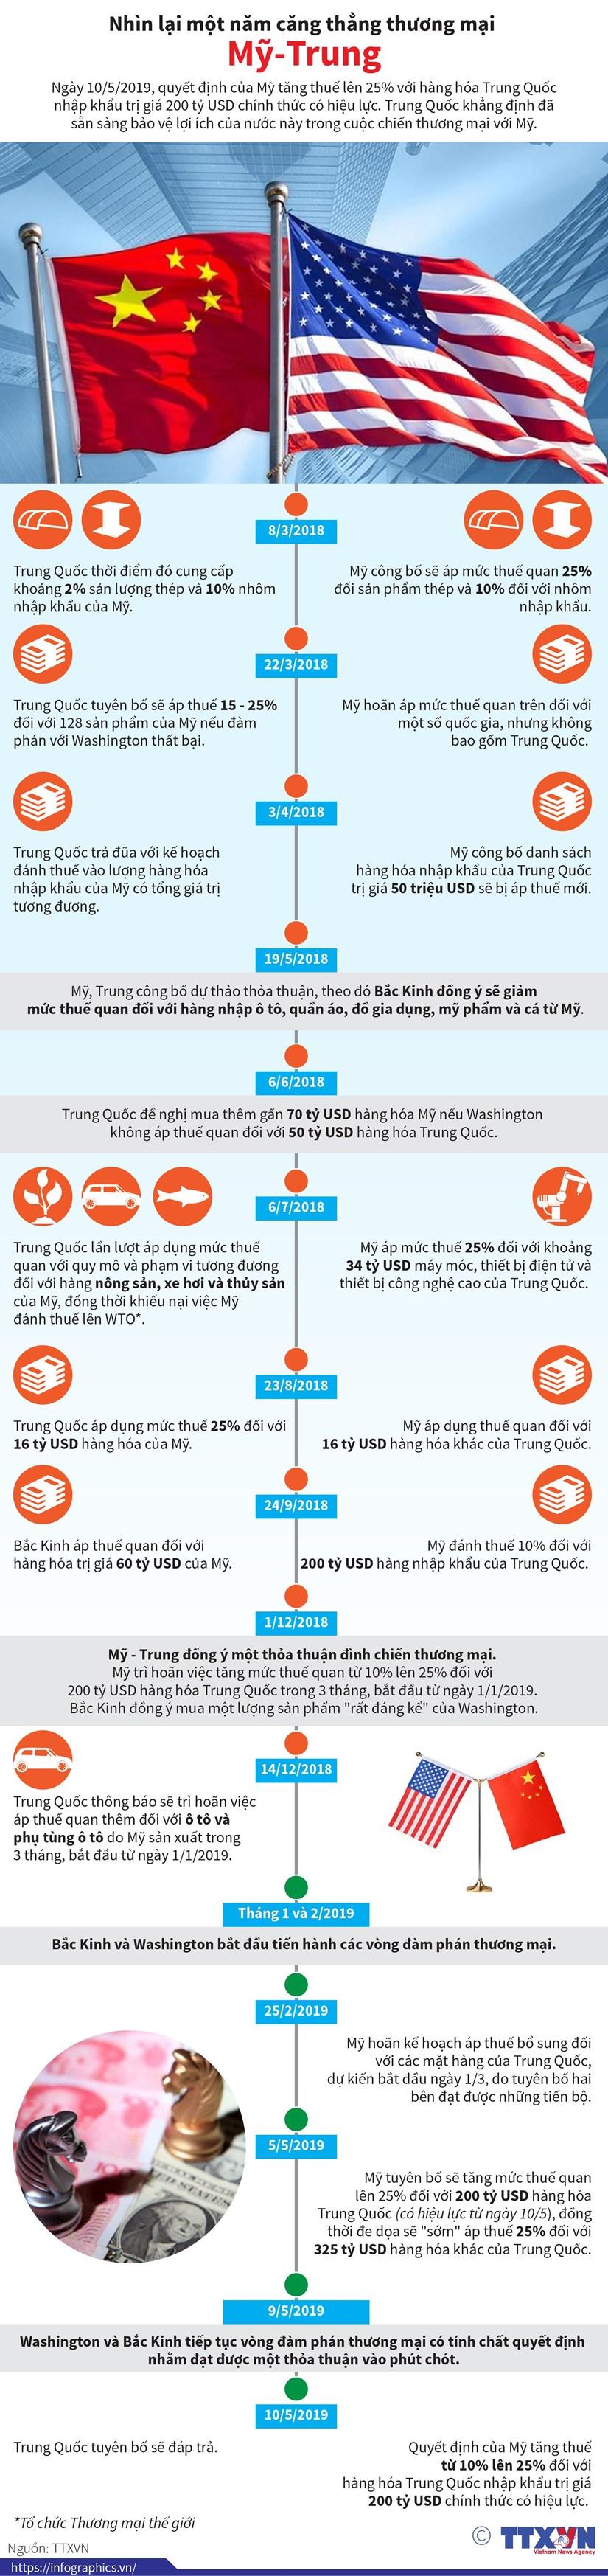 [Infographics] Nhin lai mot nam cang thang thuong mai My-Trung hinh anh 1